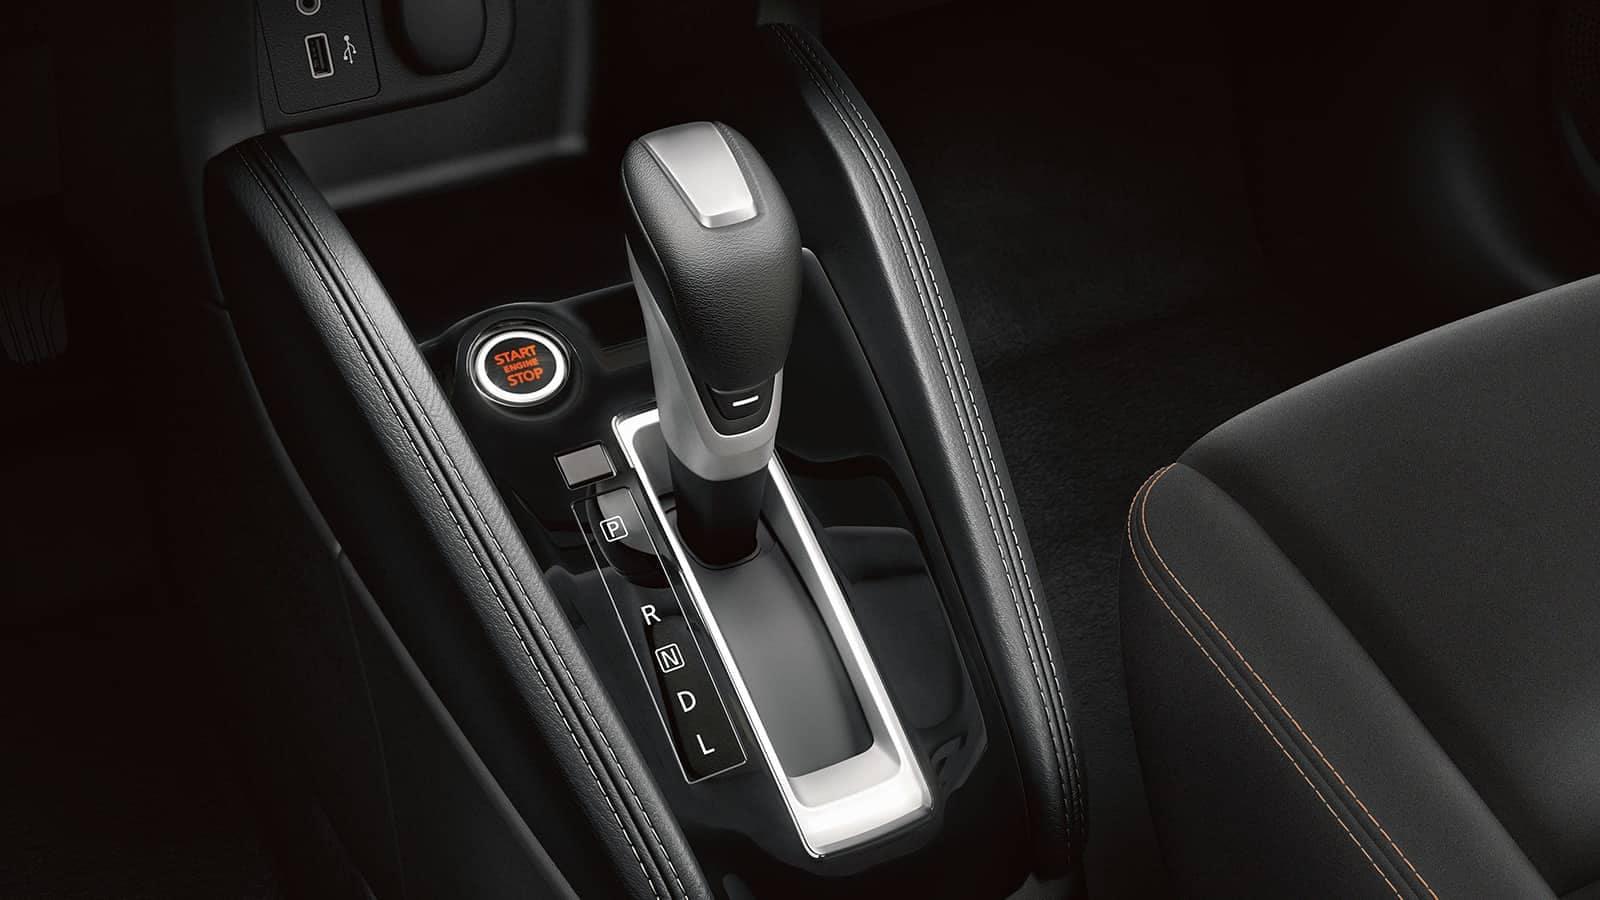 2019 Nissan Kicks shifter